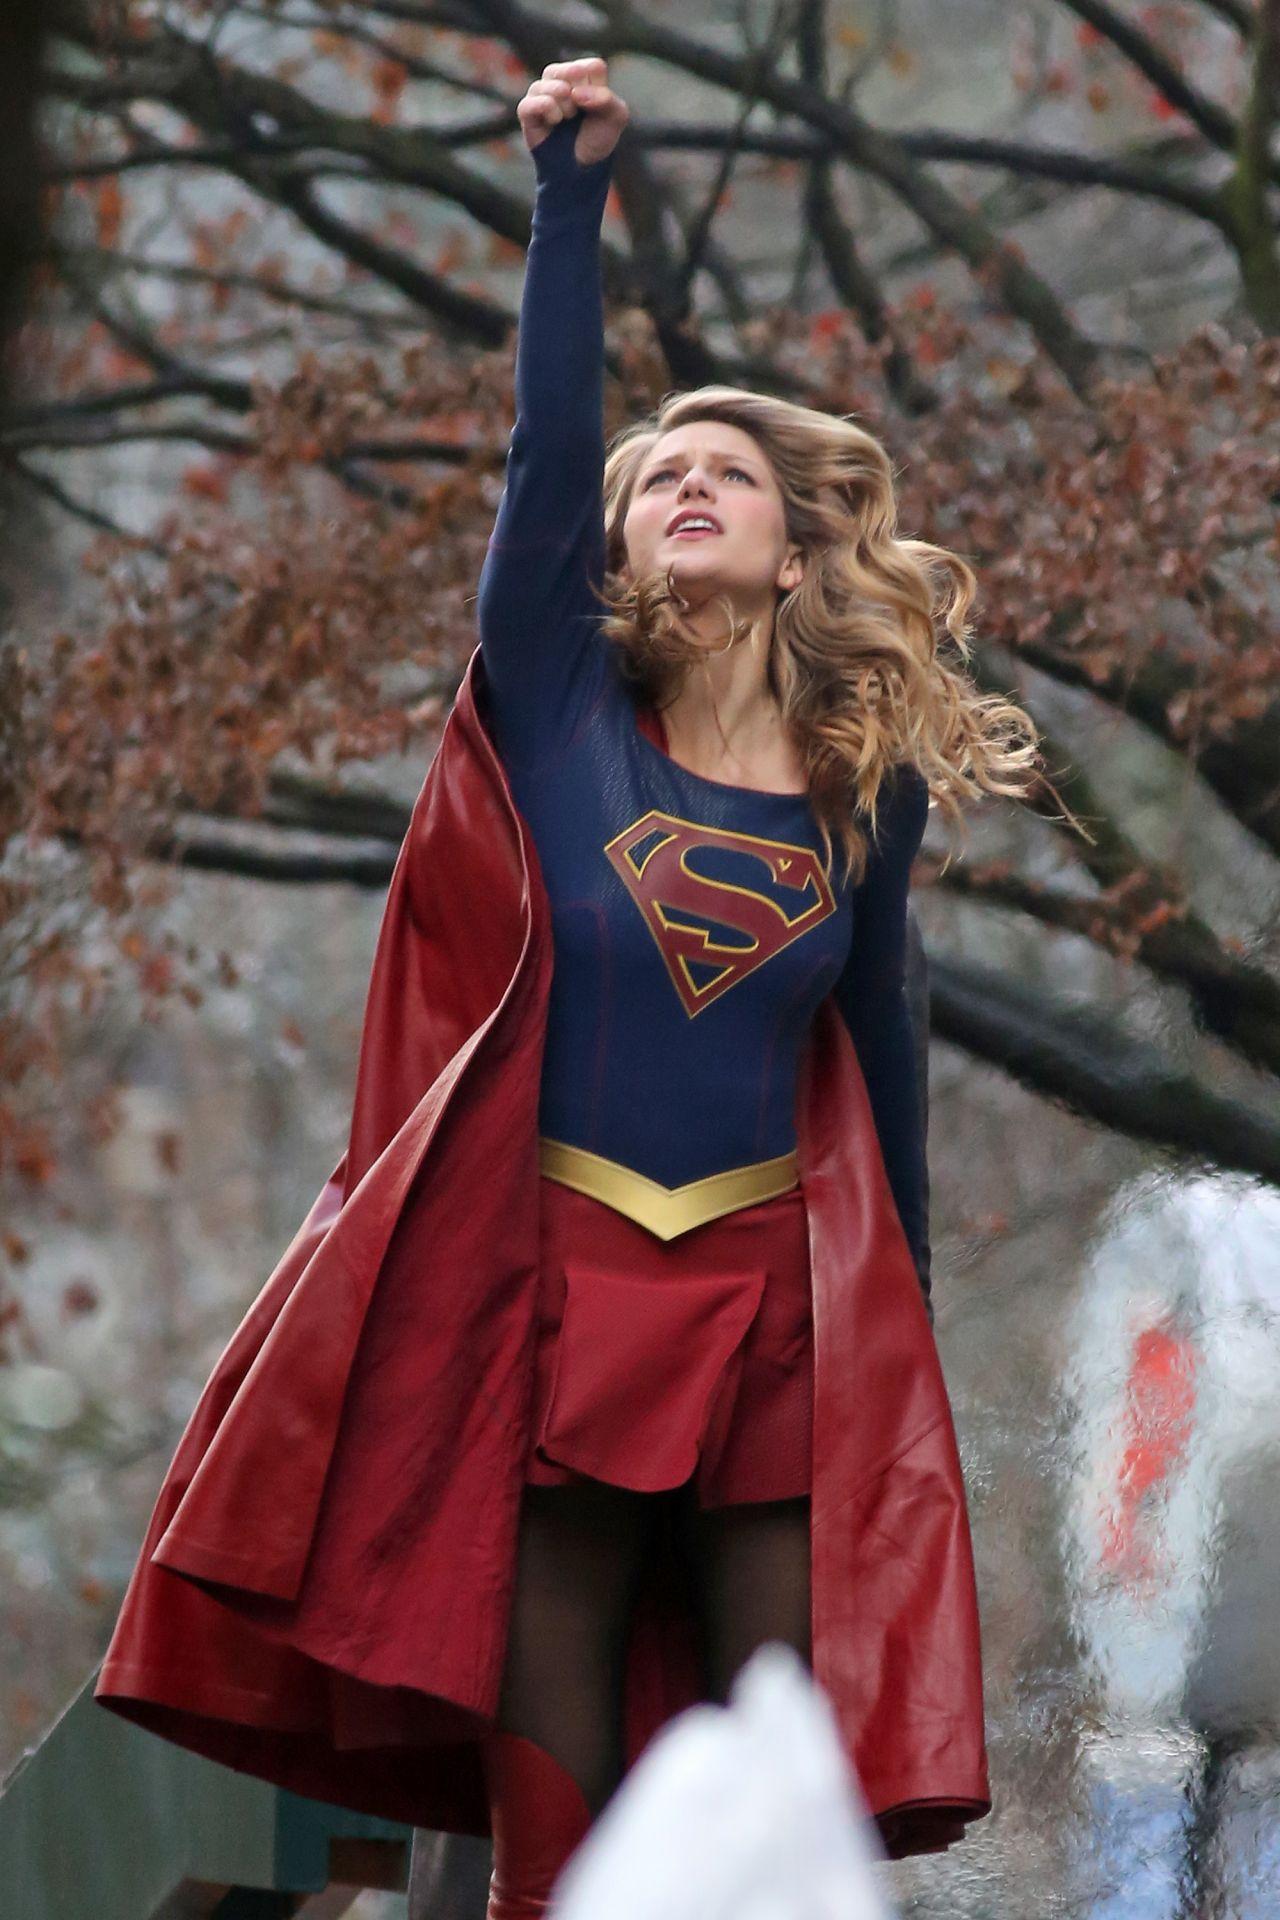 Melissa Benoist Filming A Scene For Supergirl In